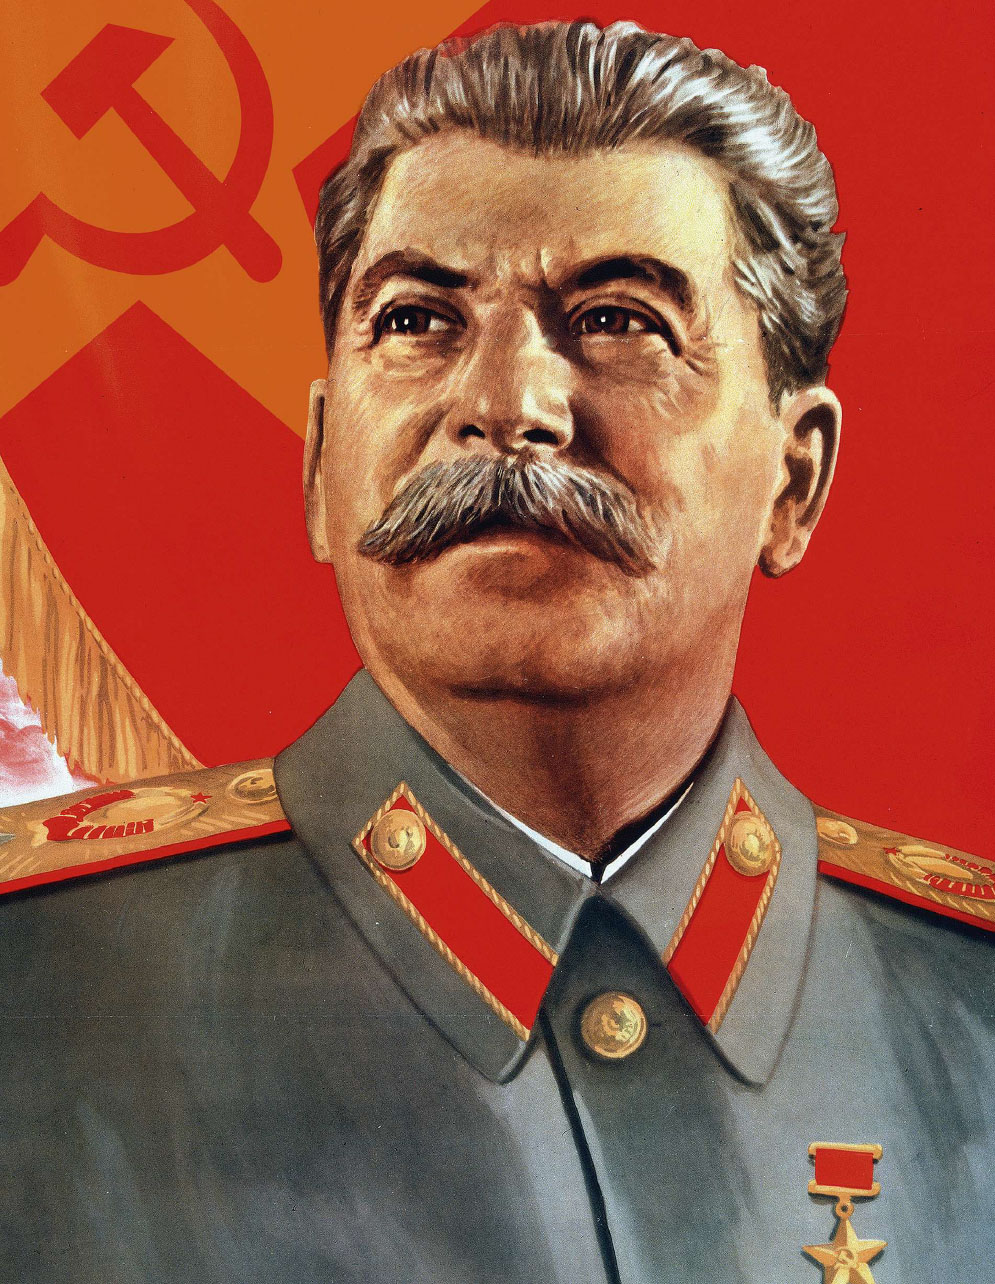 Joseph Stalin, former dictator of the Soviet Union